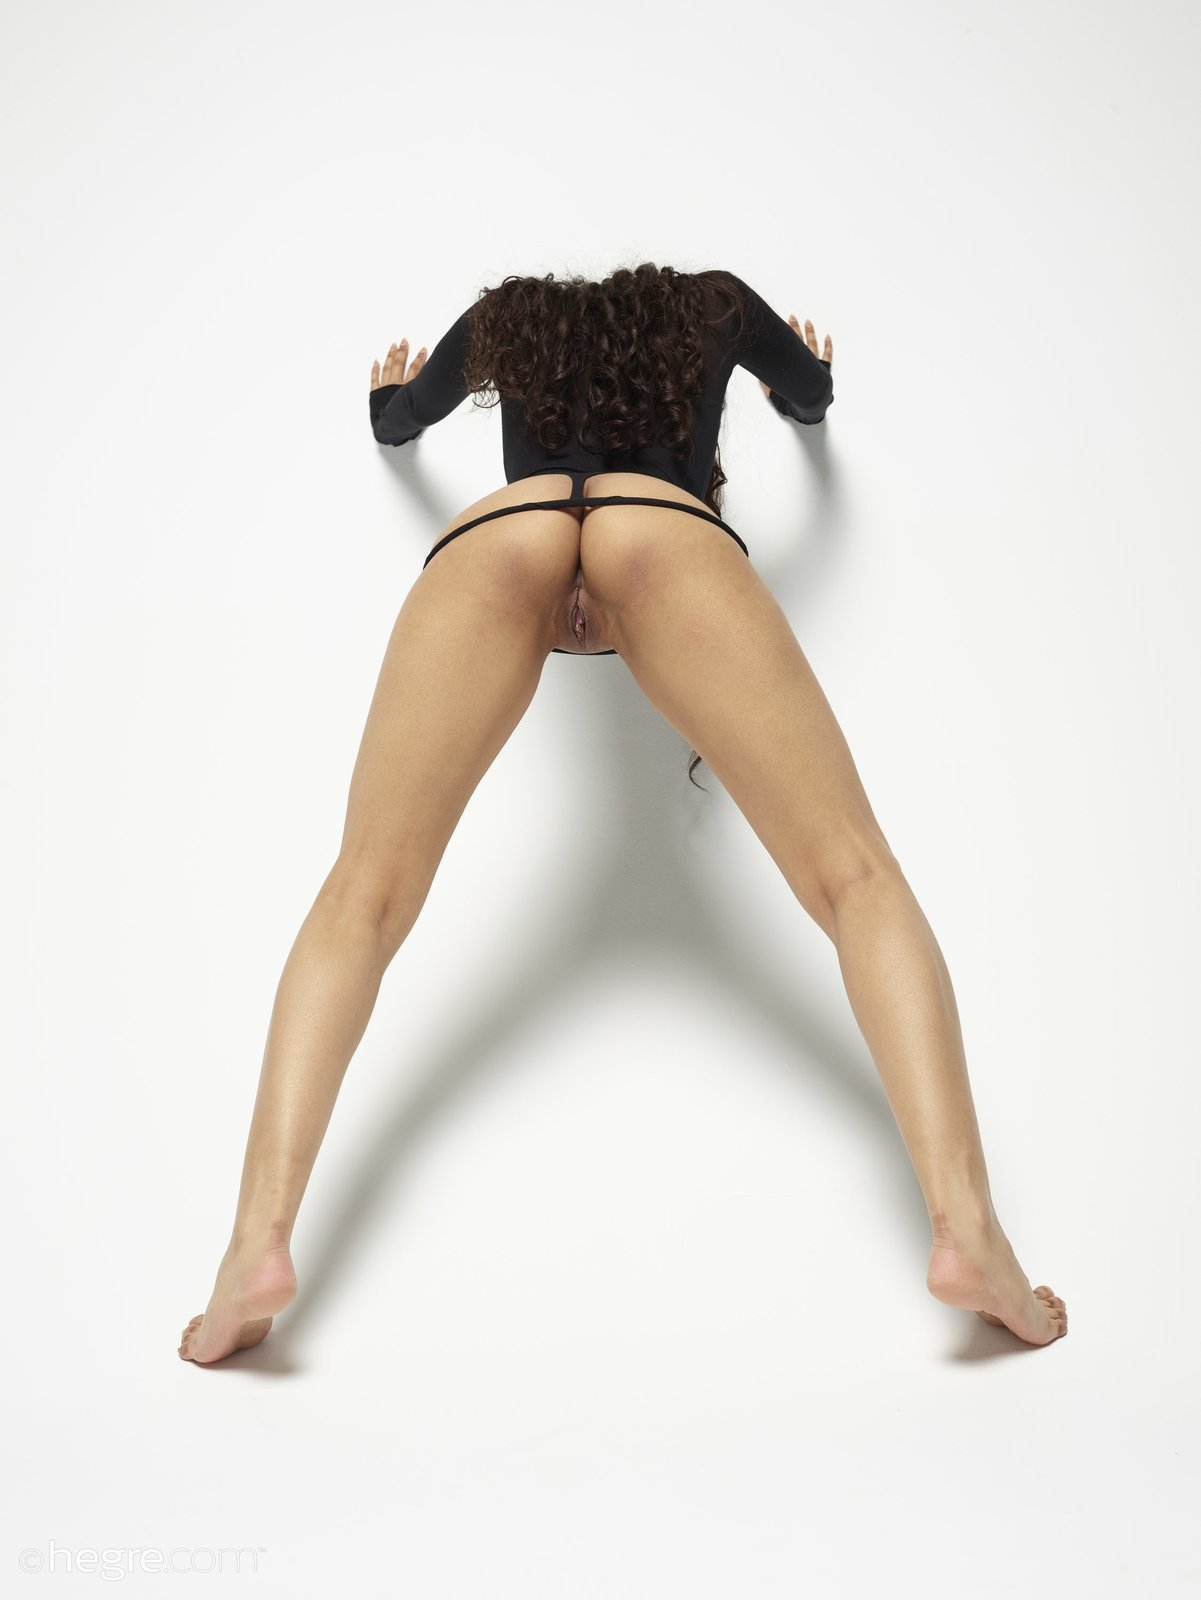 Anaya In Erotic Fashion By Hegre-Art (nude Photo 9 Of 12)